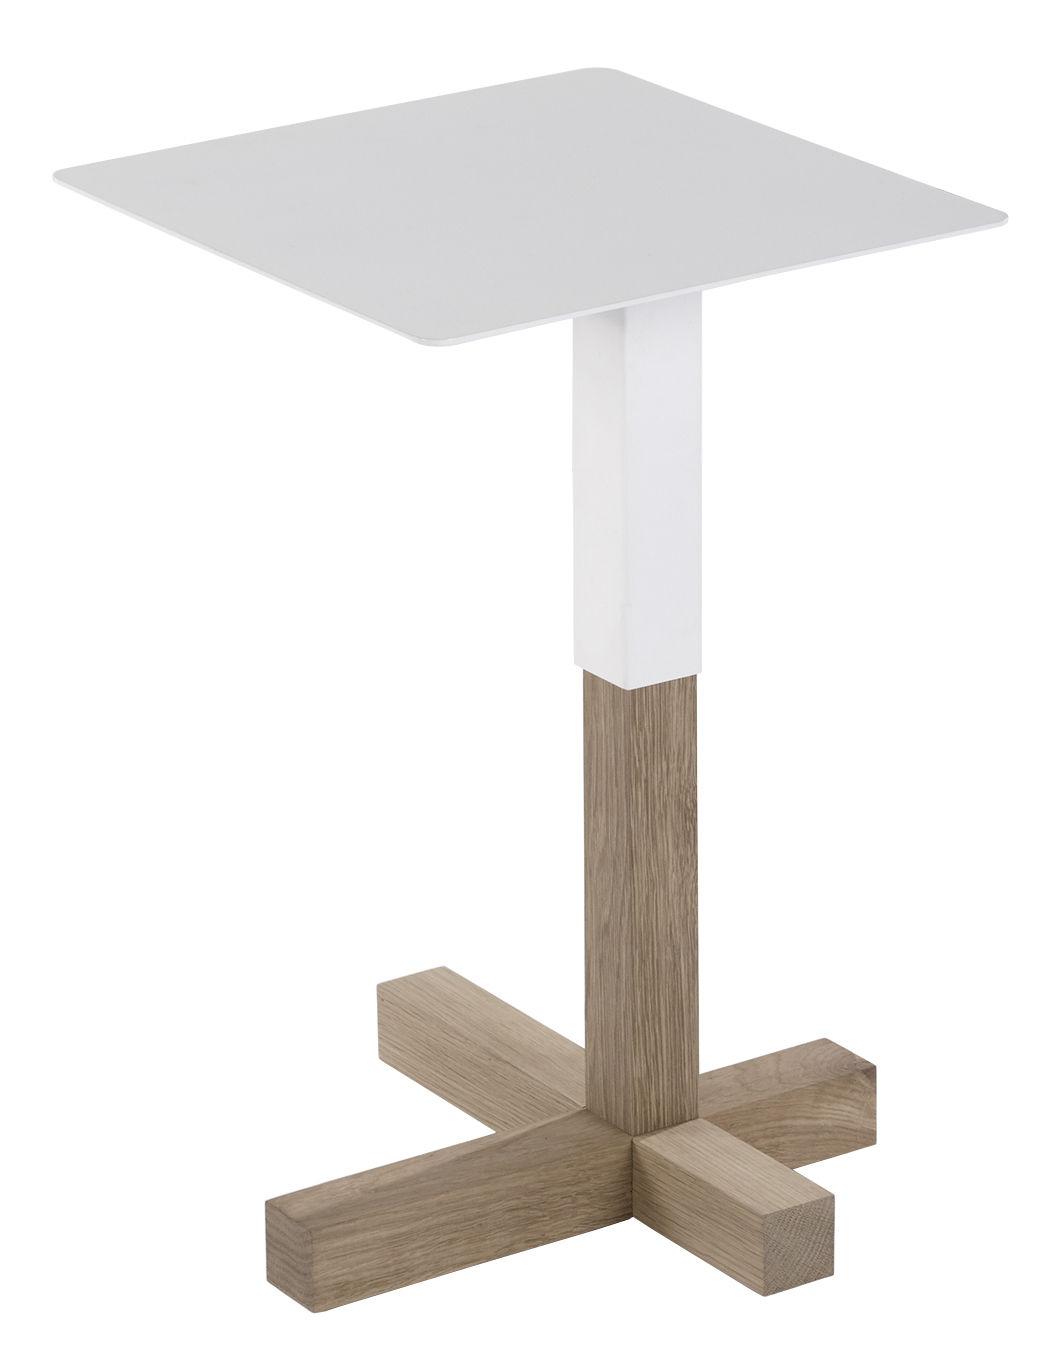 quad holz metall 36 x 36 cm universo positivo beistelltisch. Black Bedroom Furniture Sets. Home Design Ideas